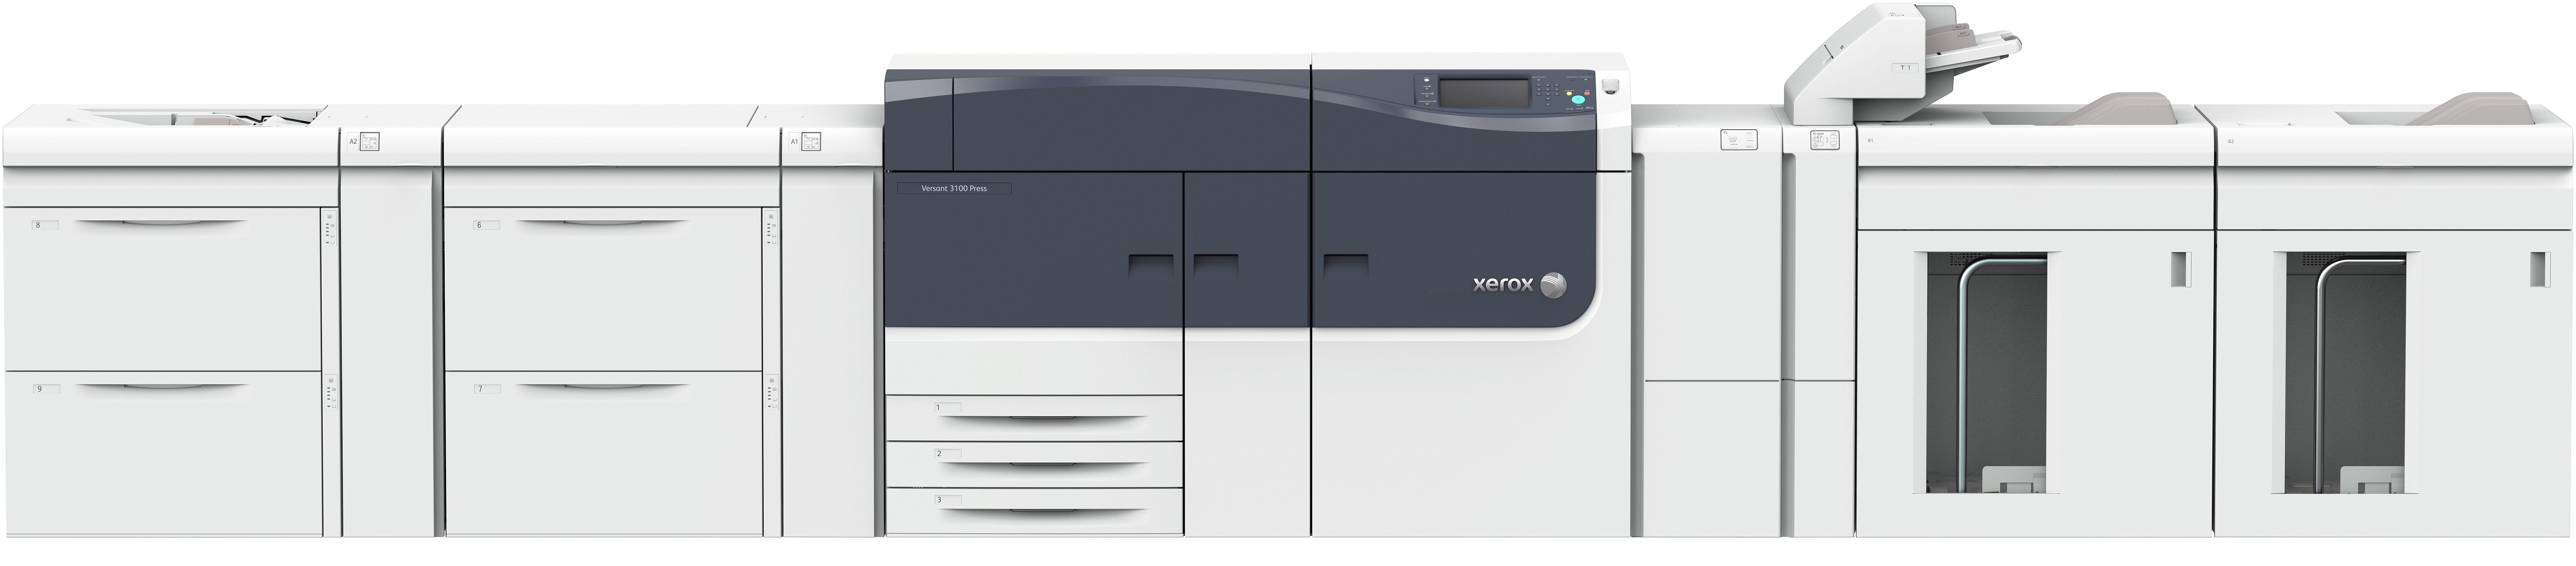 Xerox Versant 3100 Press Comida